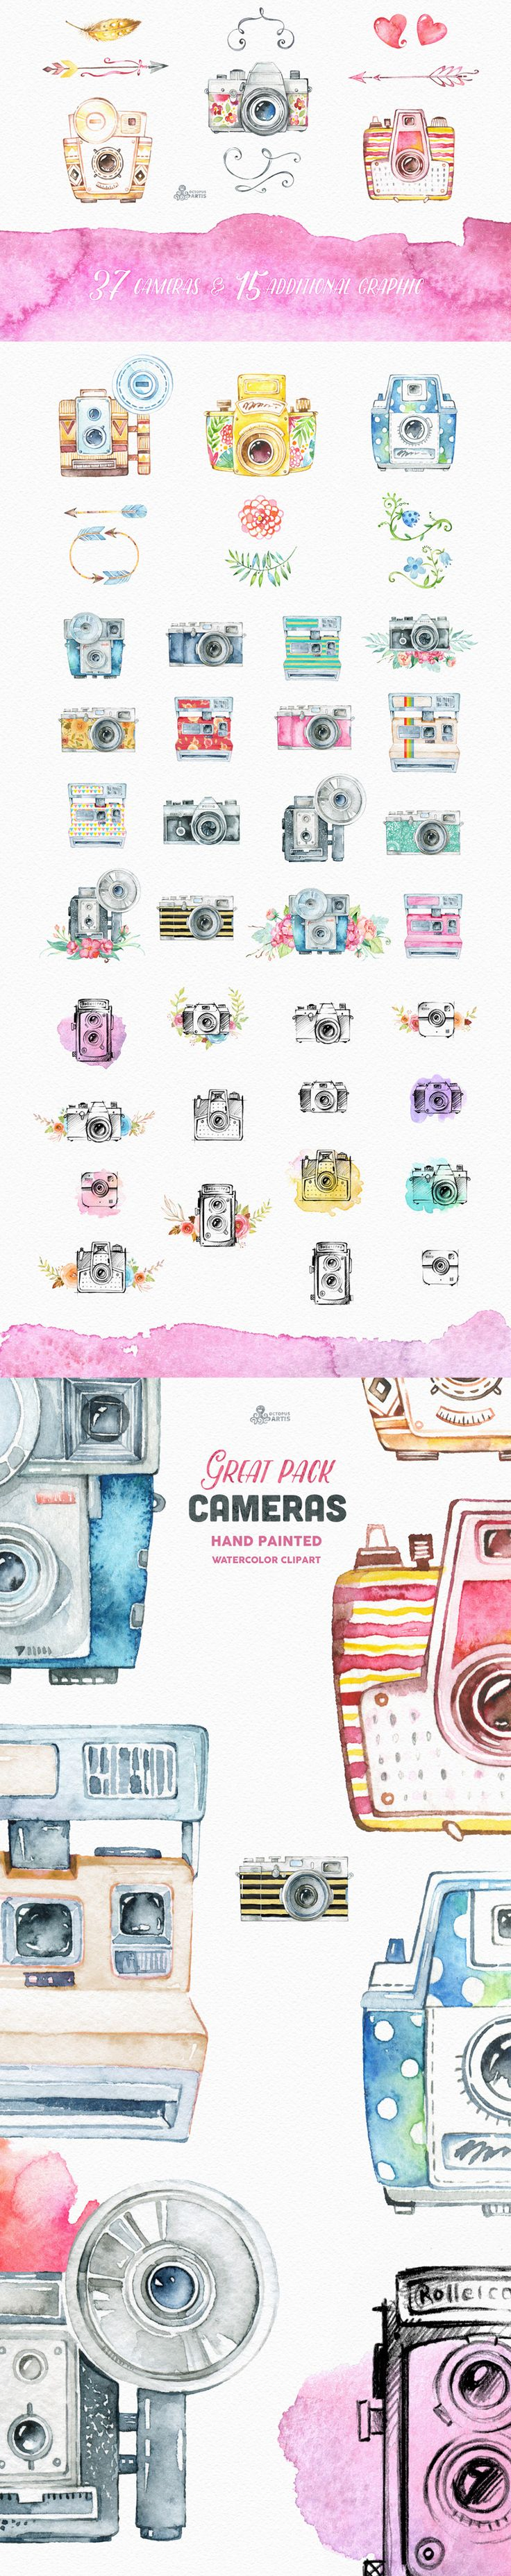 Cameras Clipart #watercolor #camera #photography